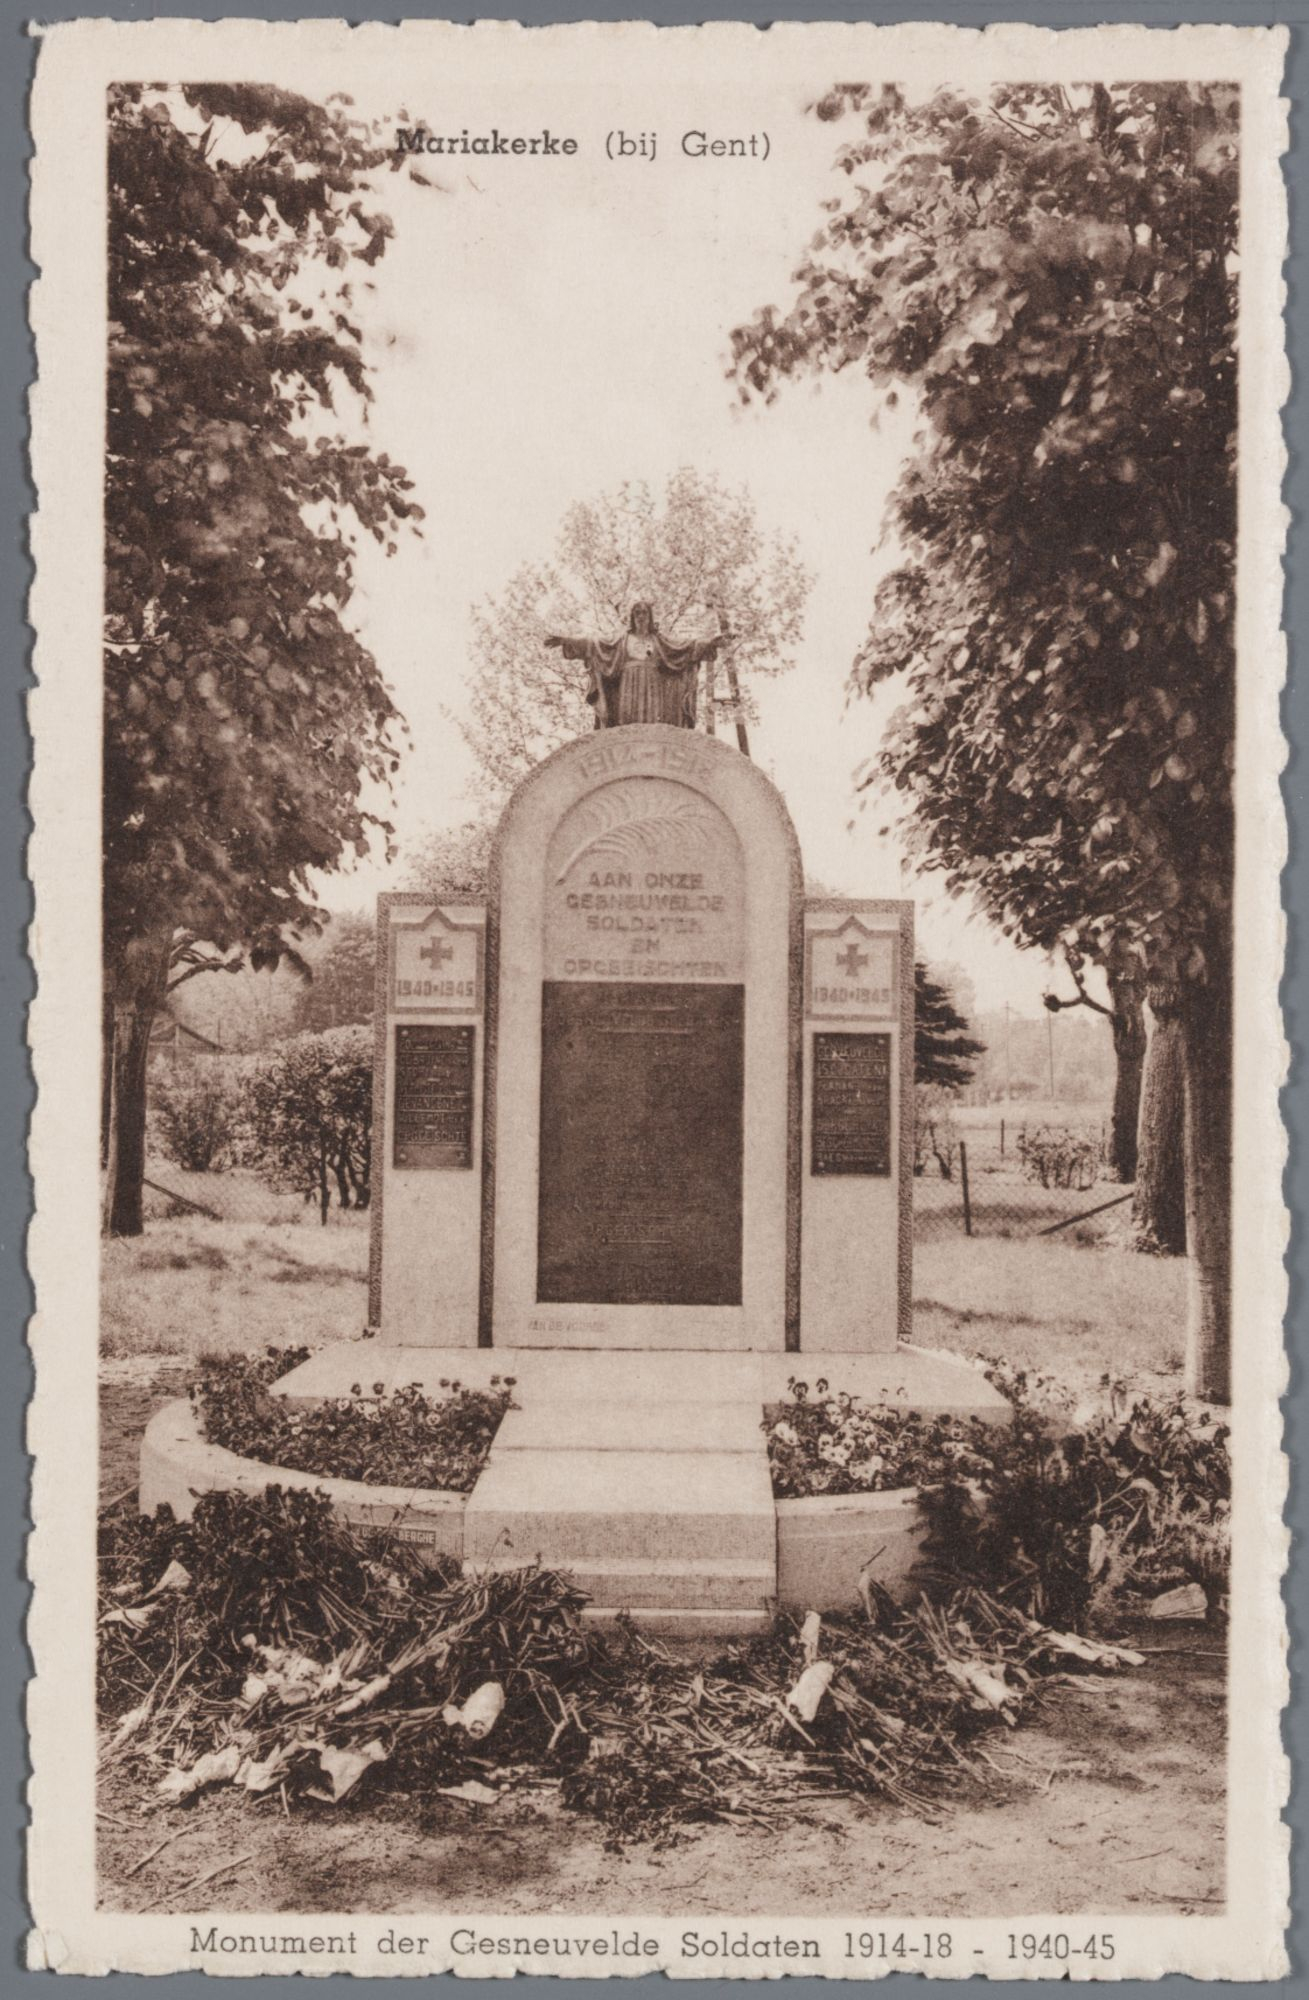 Mariakerke-bij-Gent: oorlogsmonument 1914-18